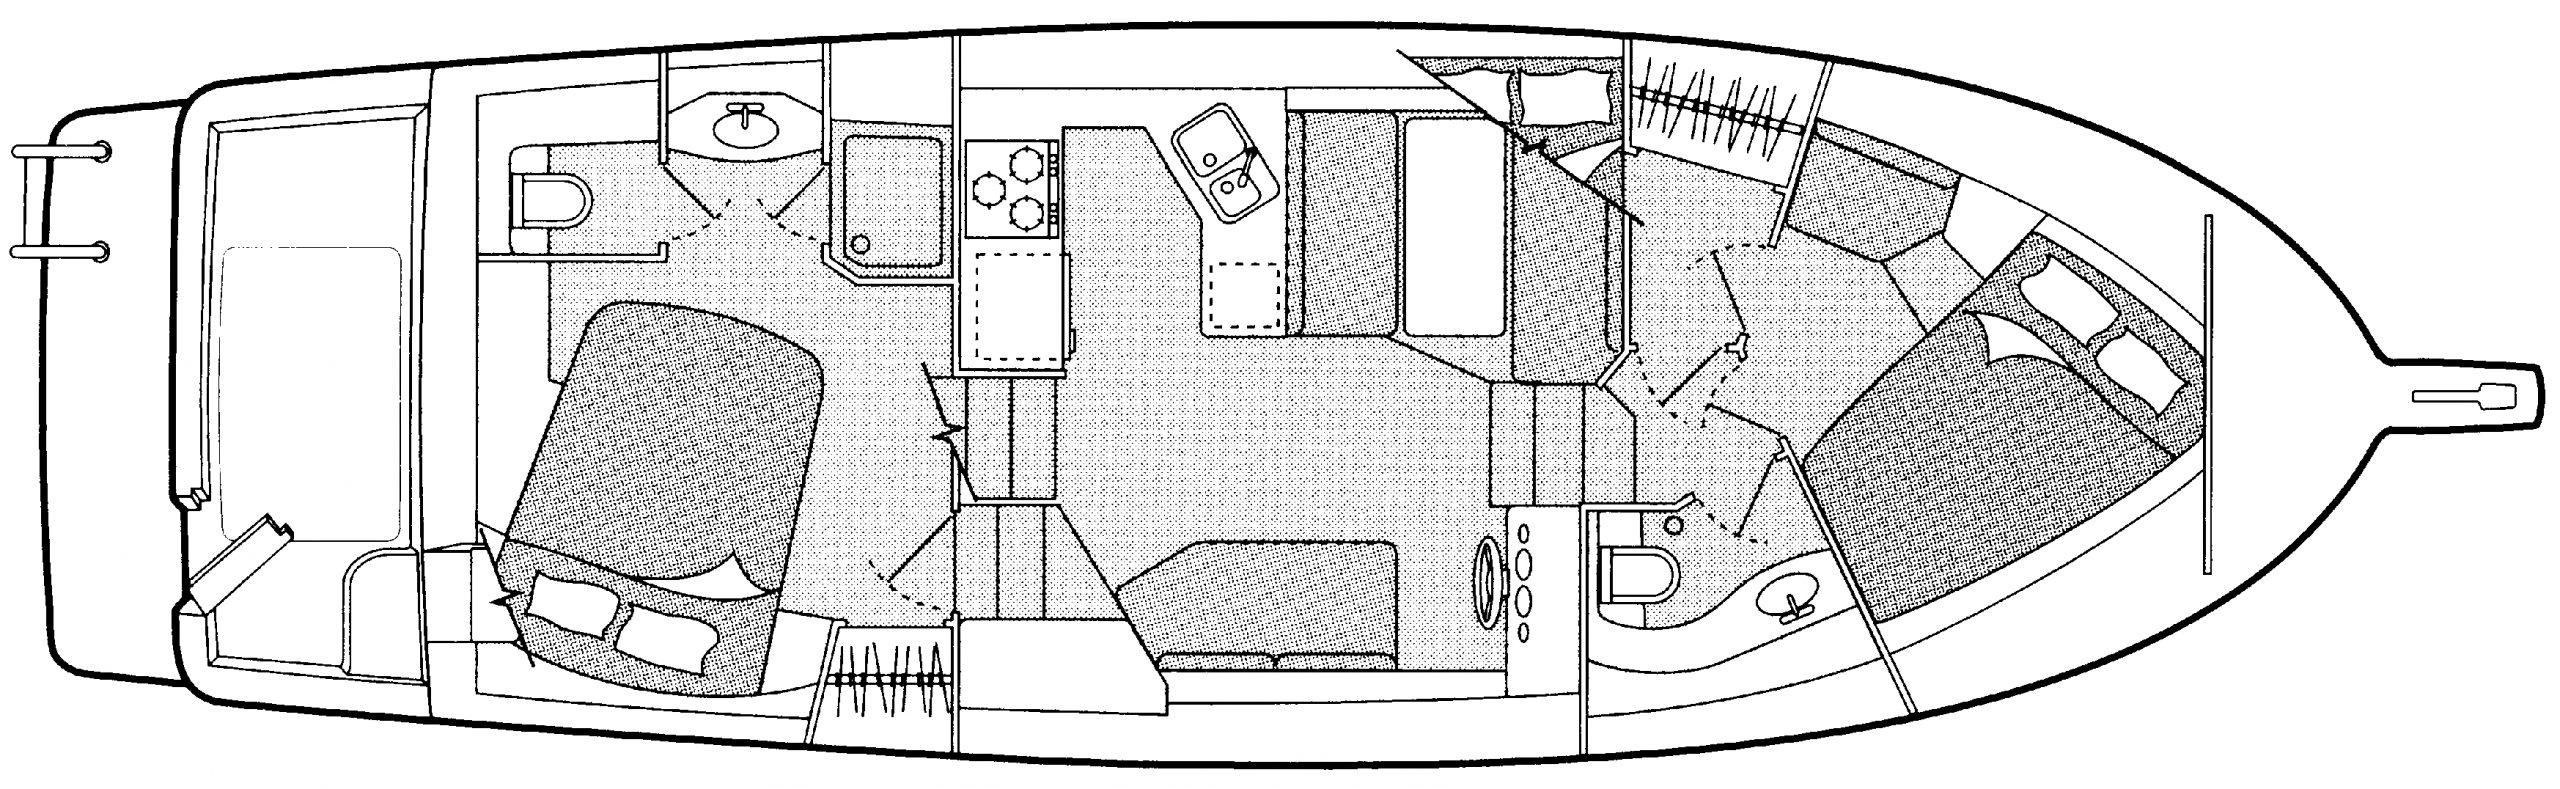 4087 Cockpit Motor Yacht Floor Plan 1